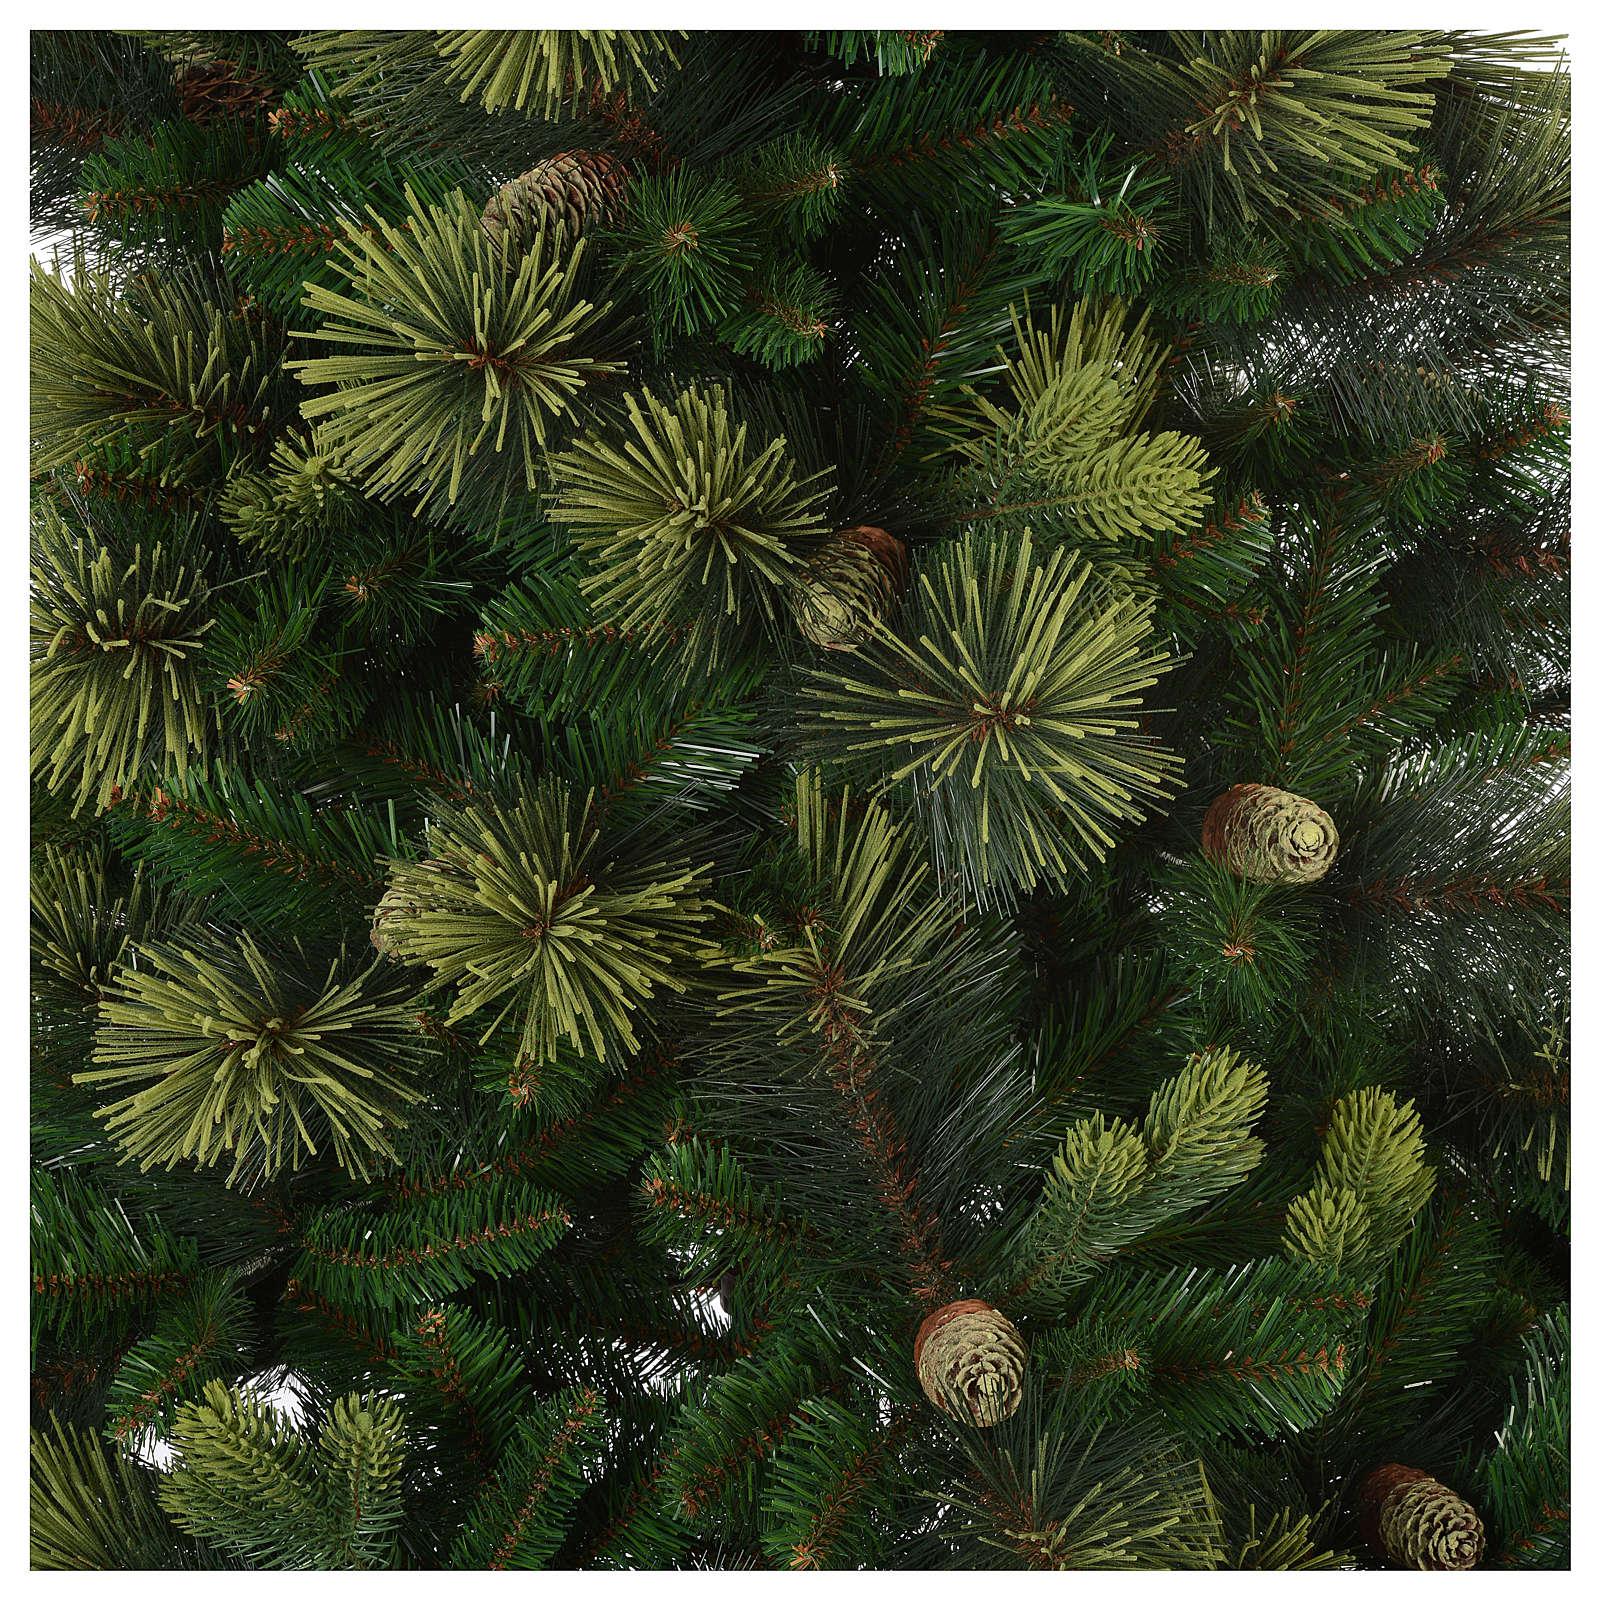 Christmas tree 210 cm, green with pine cones Carolina 3